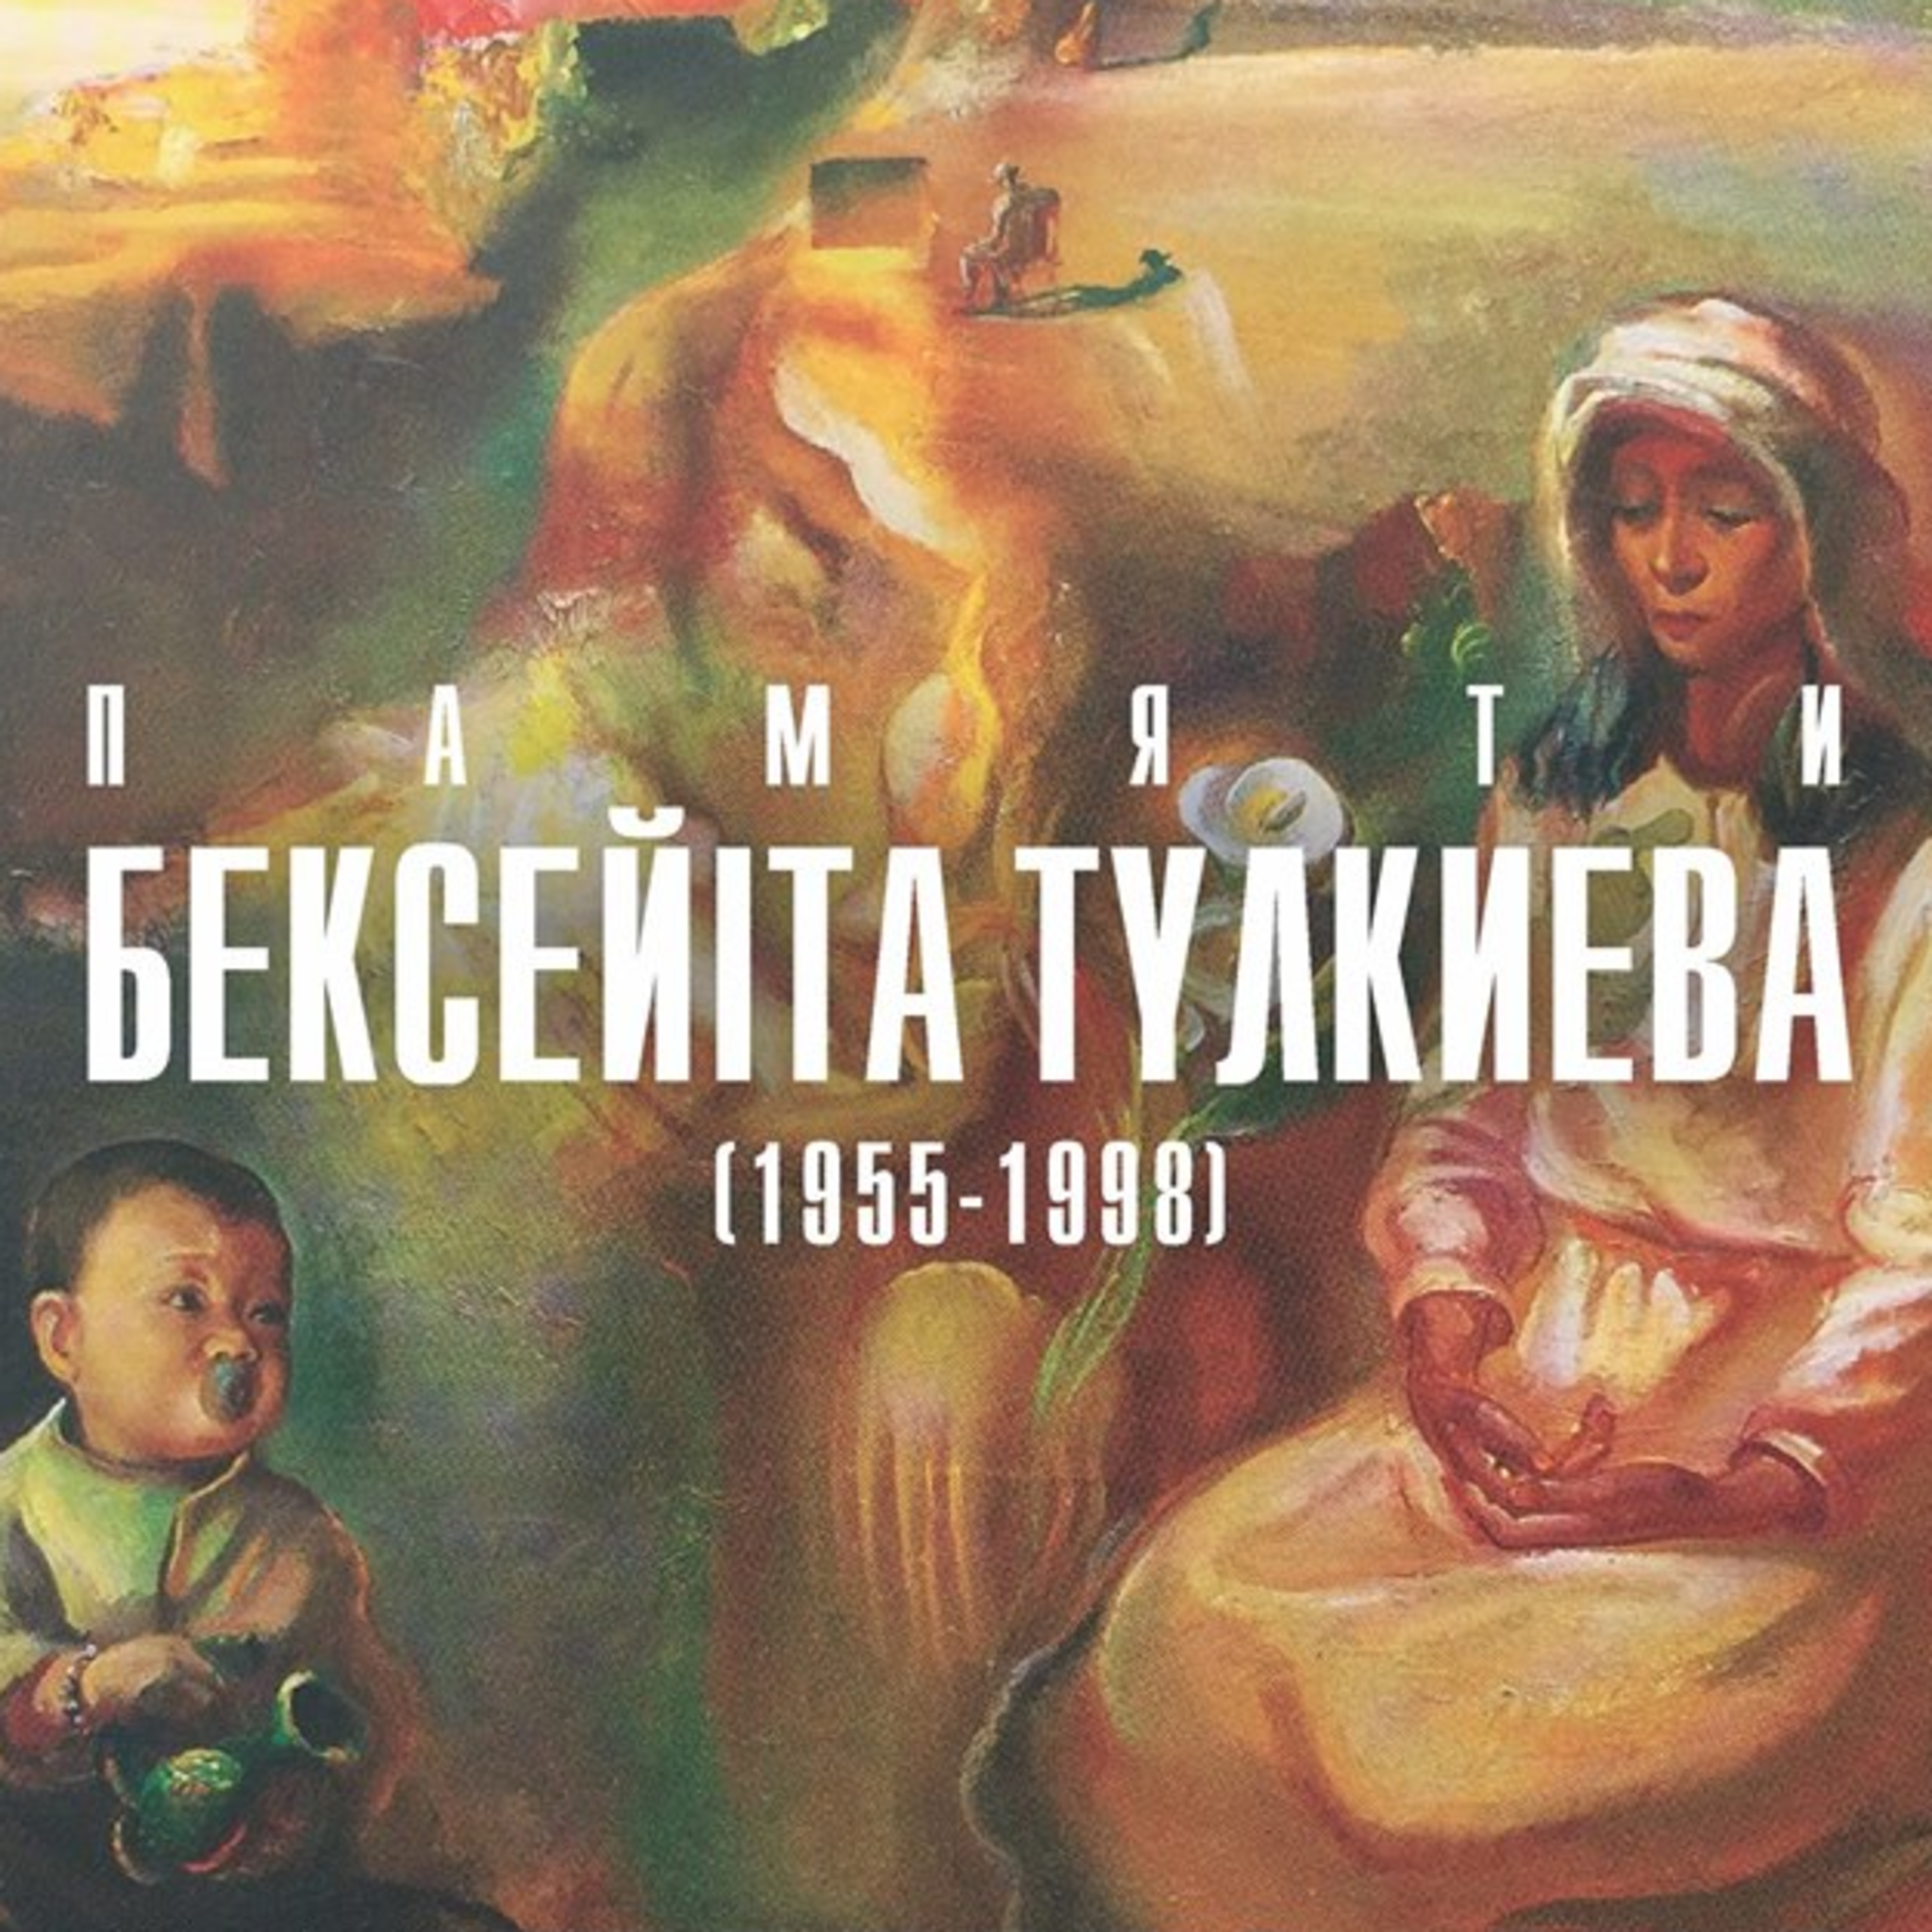 Beksite Tyulkiev's exhibition